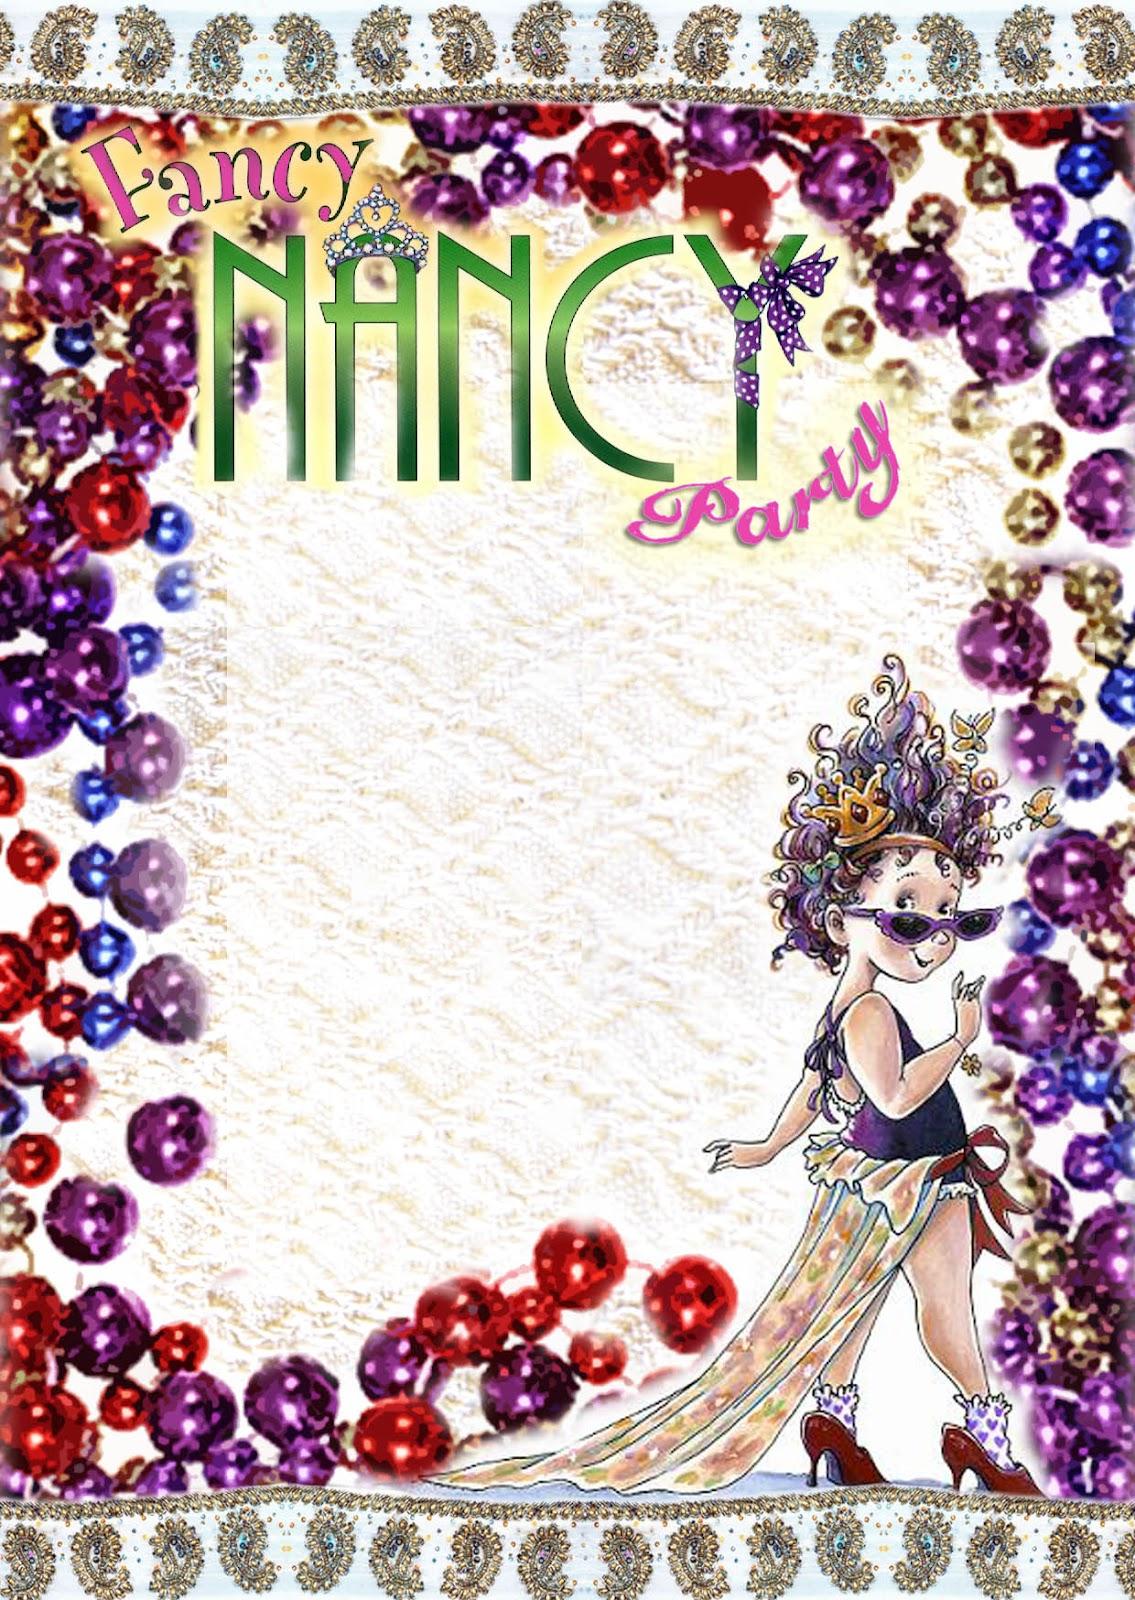 free kids party invitations  fancy nancy printable